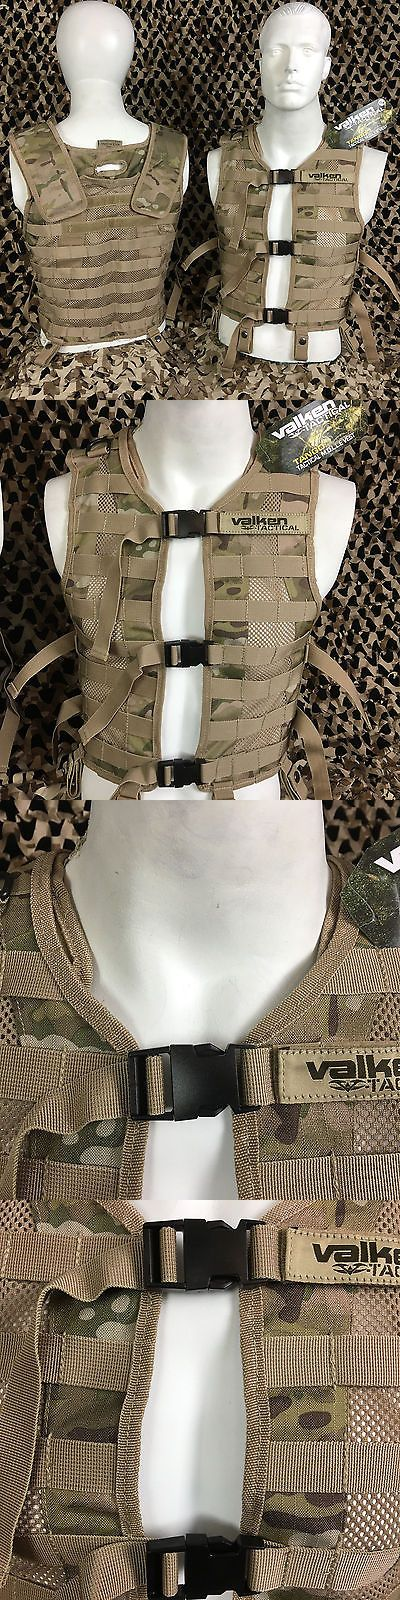 Vests 36284: New Valken V-Tac Tango Ii Molle Tactical Paintball Vest - V-Cam Camo - 4Xl 5Xl -> BUY IT NOW ONLY: $69.95 on eBay!